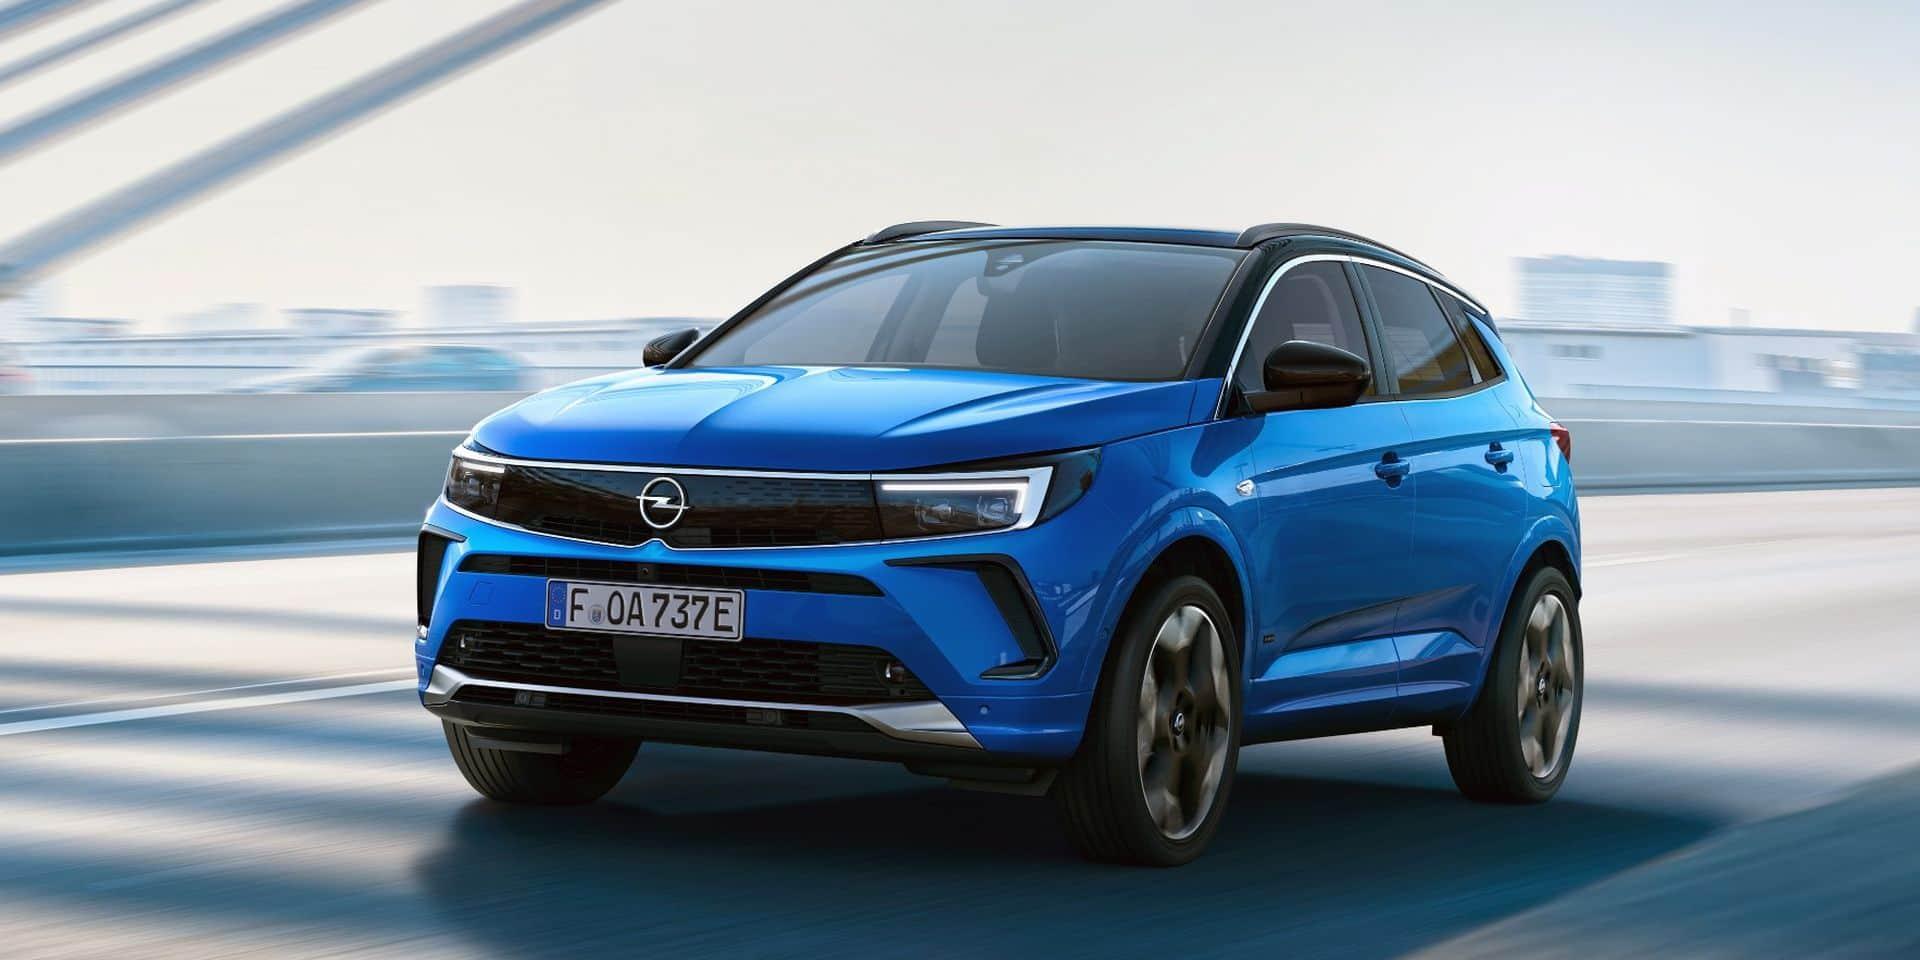 L'Opel Grandland s'affirme enfin